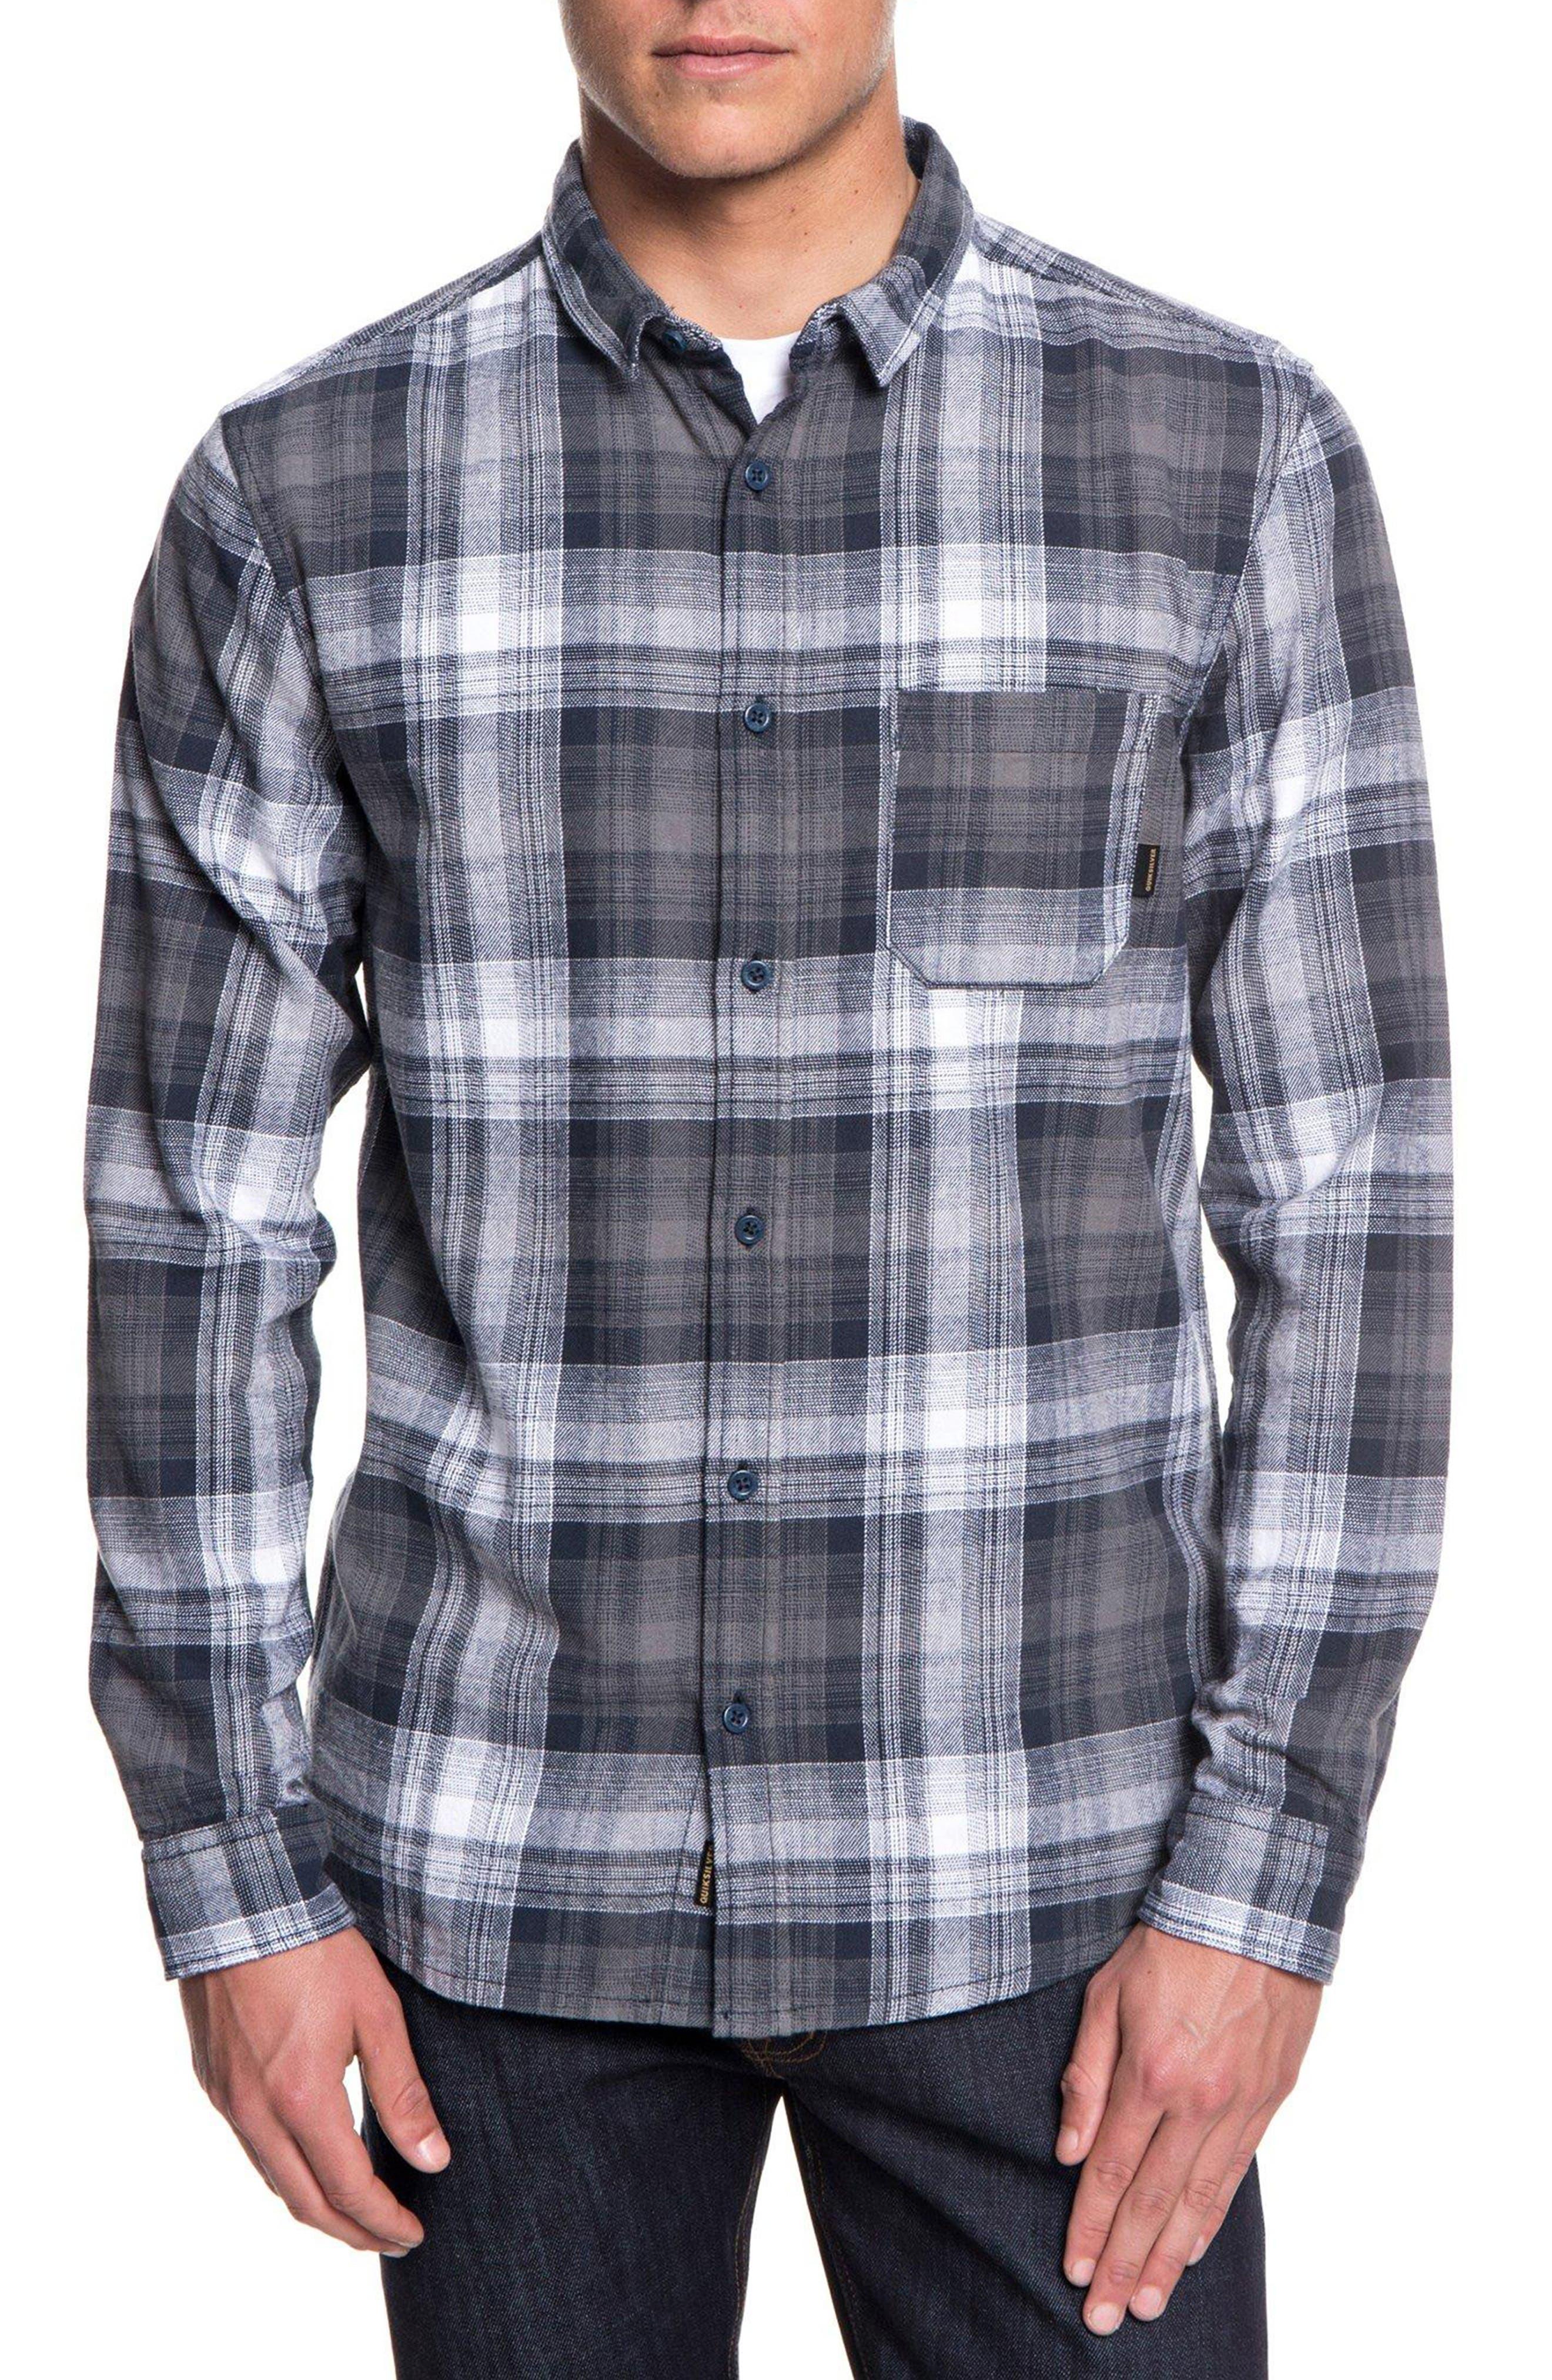 Fatherfly Plaid Shirt,                             Main thumbnail 1, color,                             BLUE NIGHT FATHERFLY CHECK